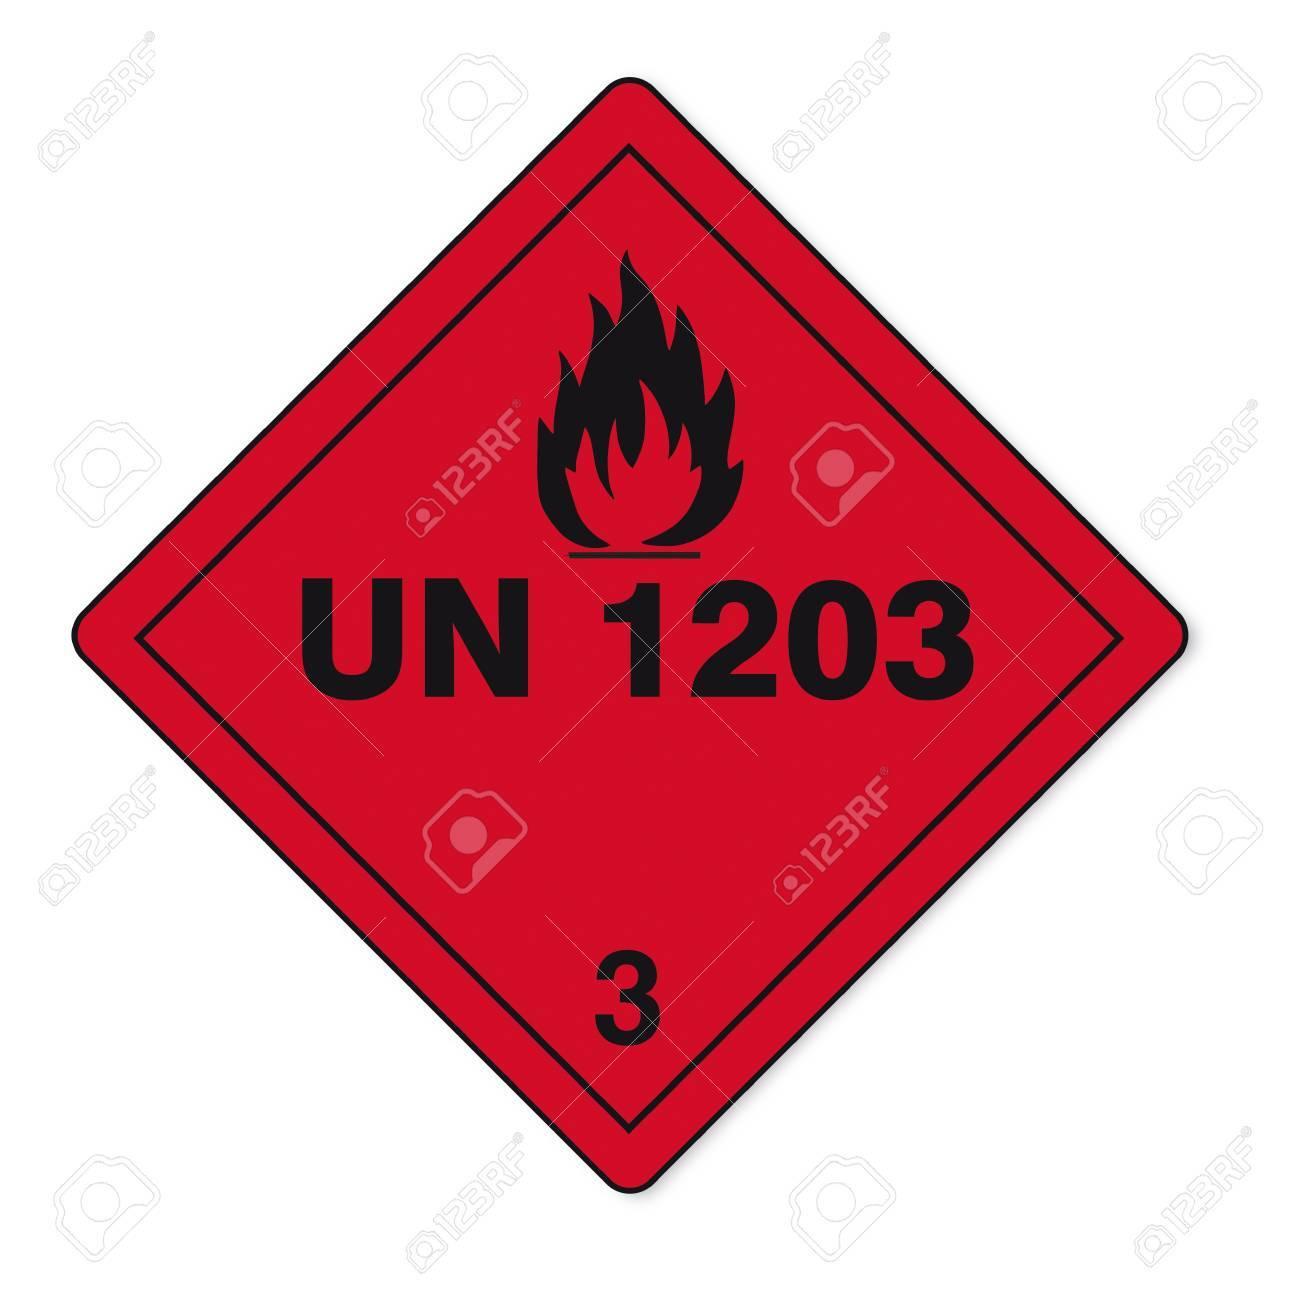 Hazardous substances signs icon flammable skull radioactive fire Stock Vector - 14380073